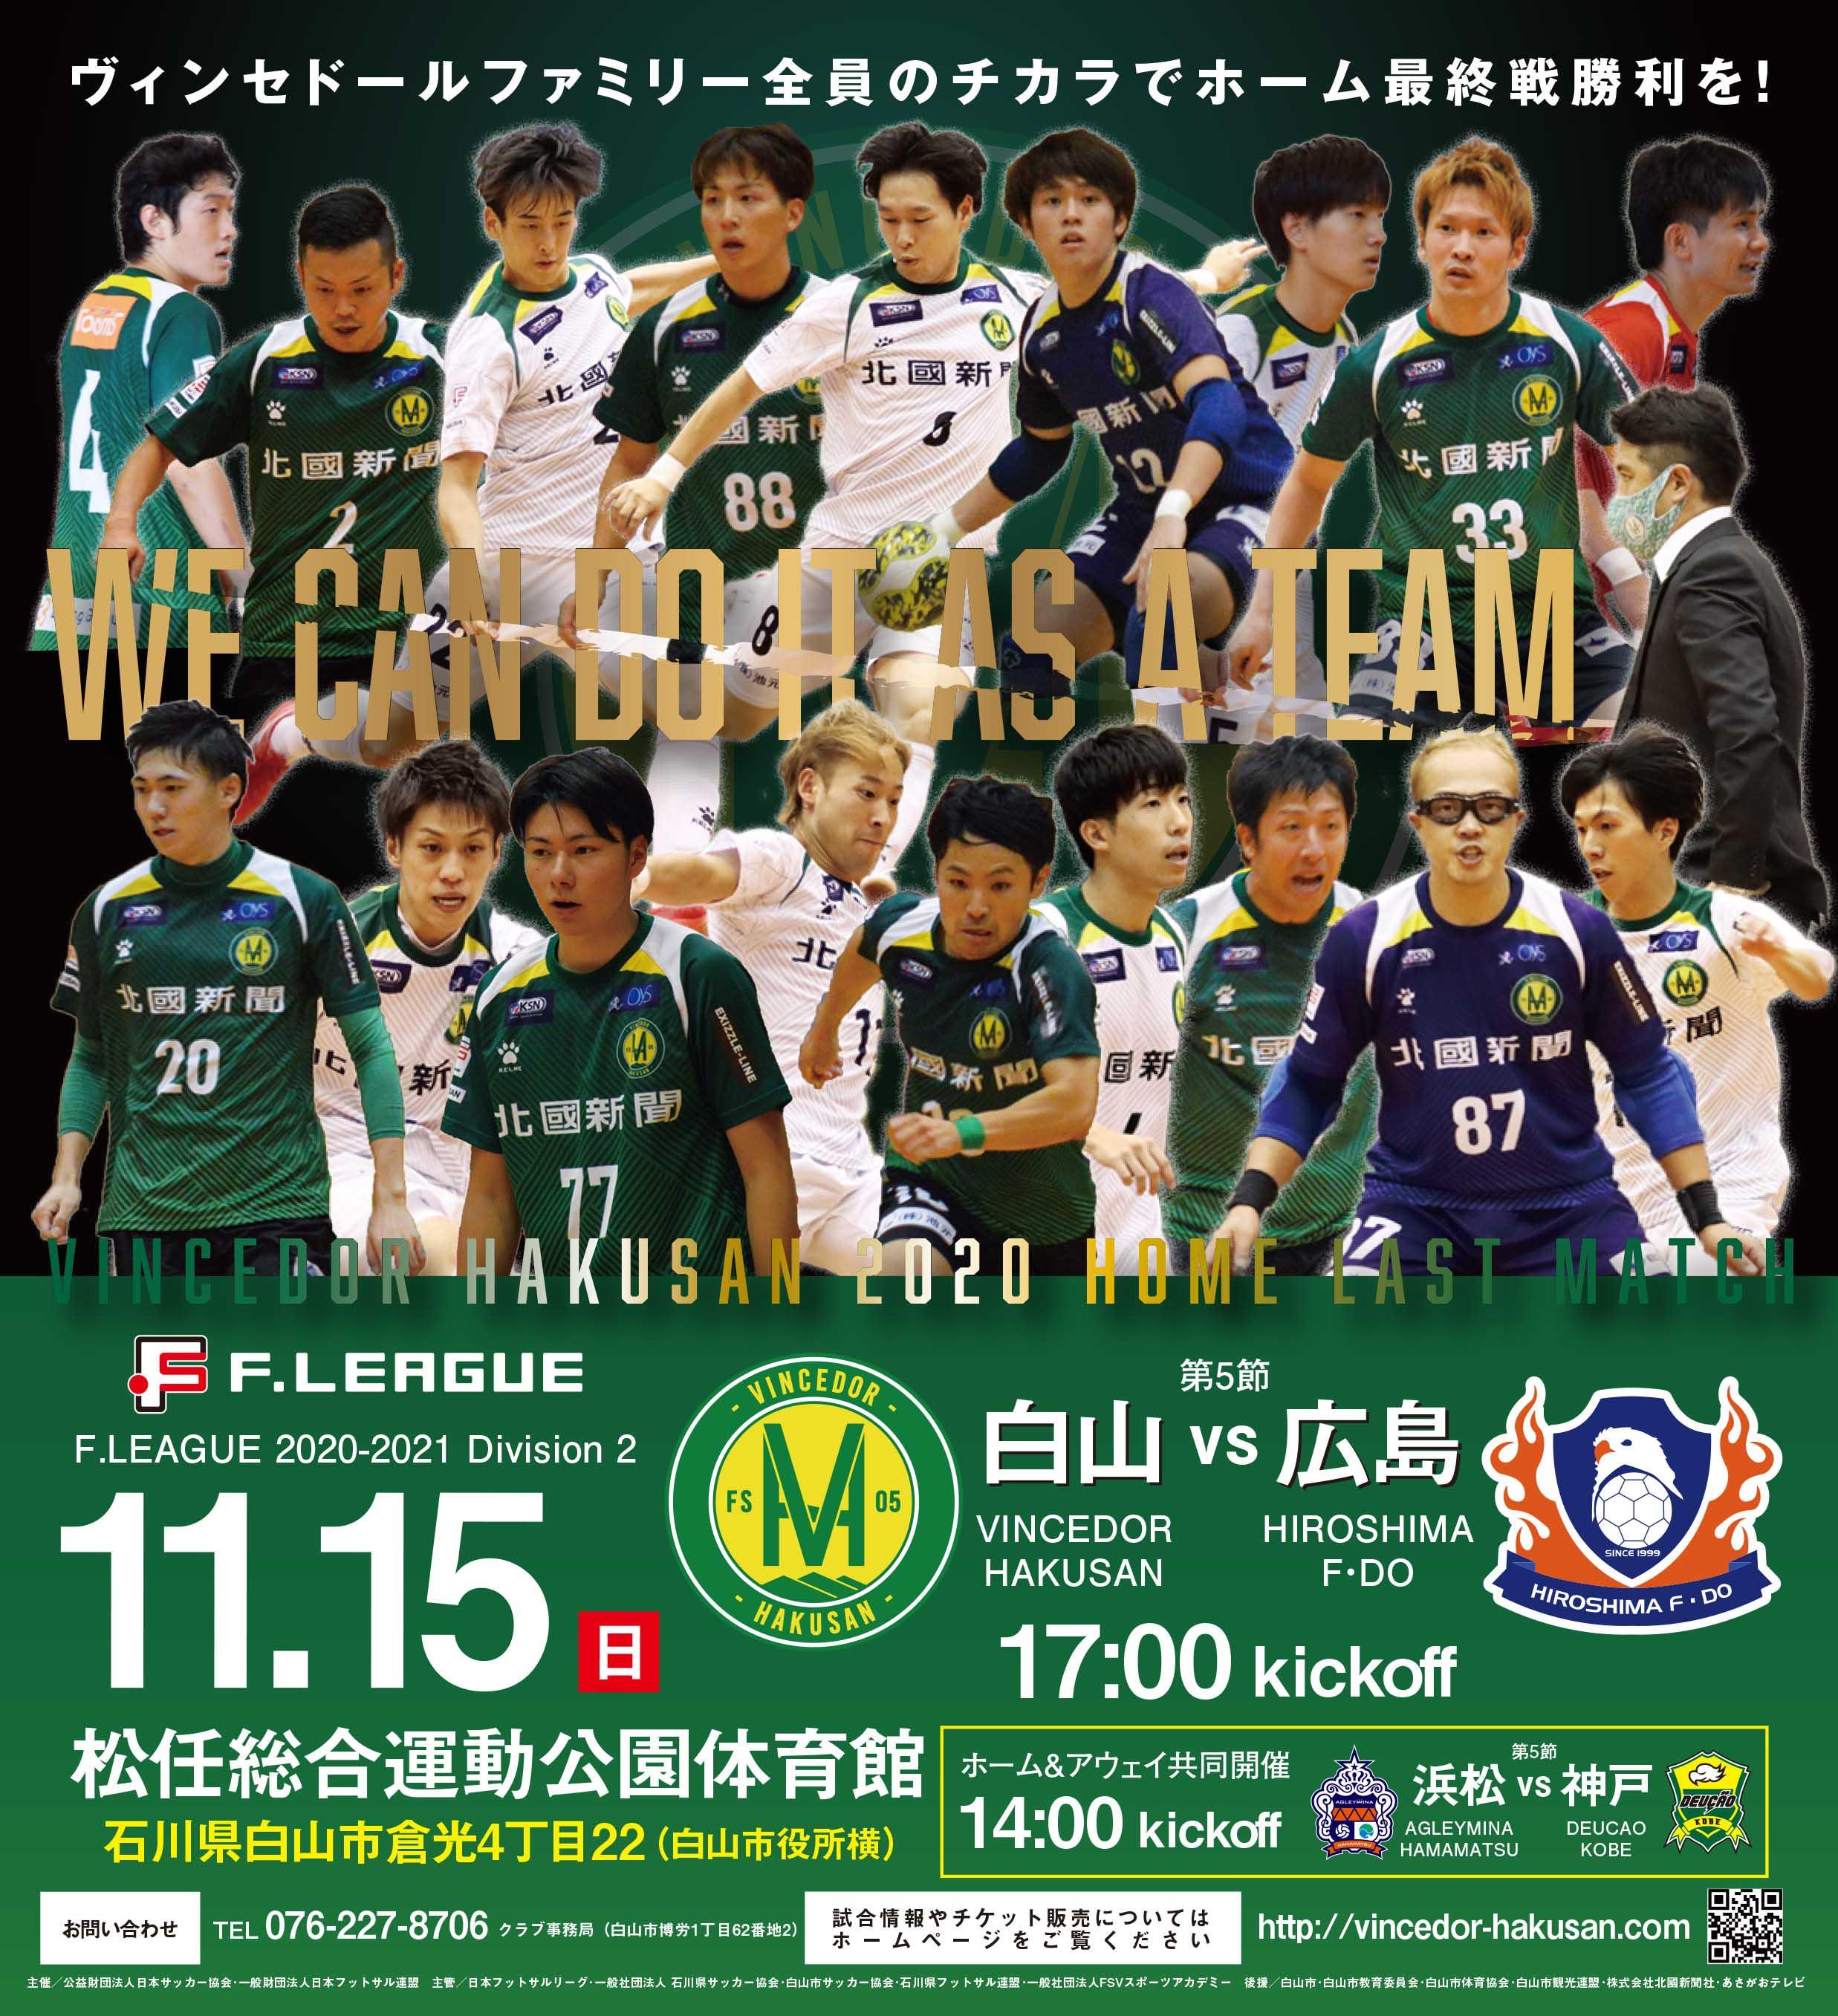 Fリーグ 2020-2021 ディビジョン2 第5節 H&A白山共同開催 アグレミーナ浜松vsデウソン神戸/ヴィンセドール白山vs広島エフ・ドゥ